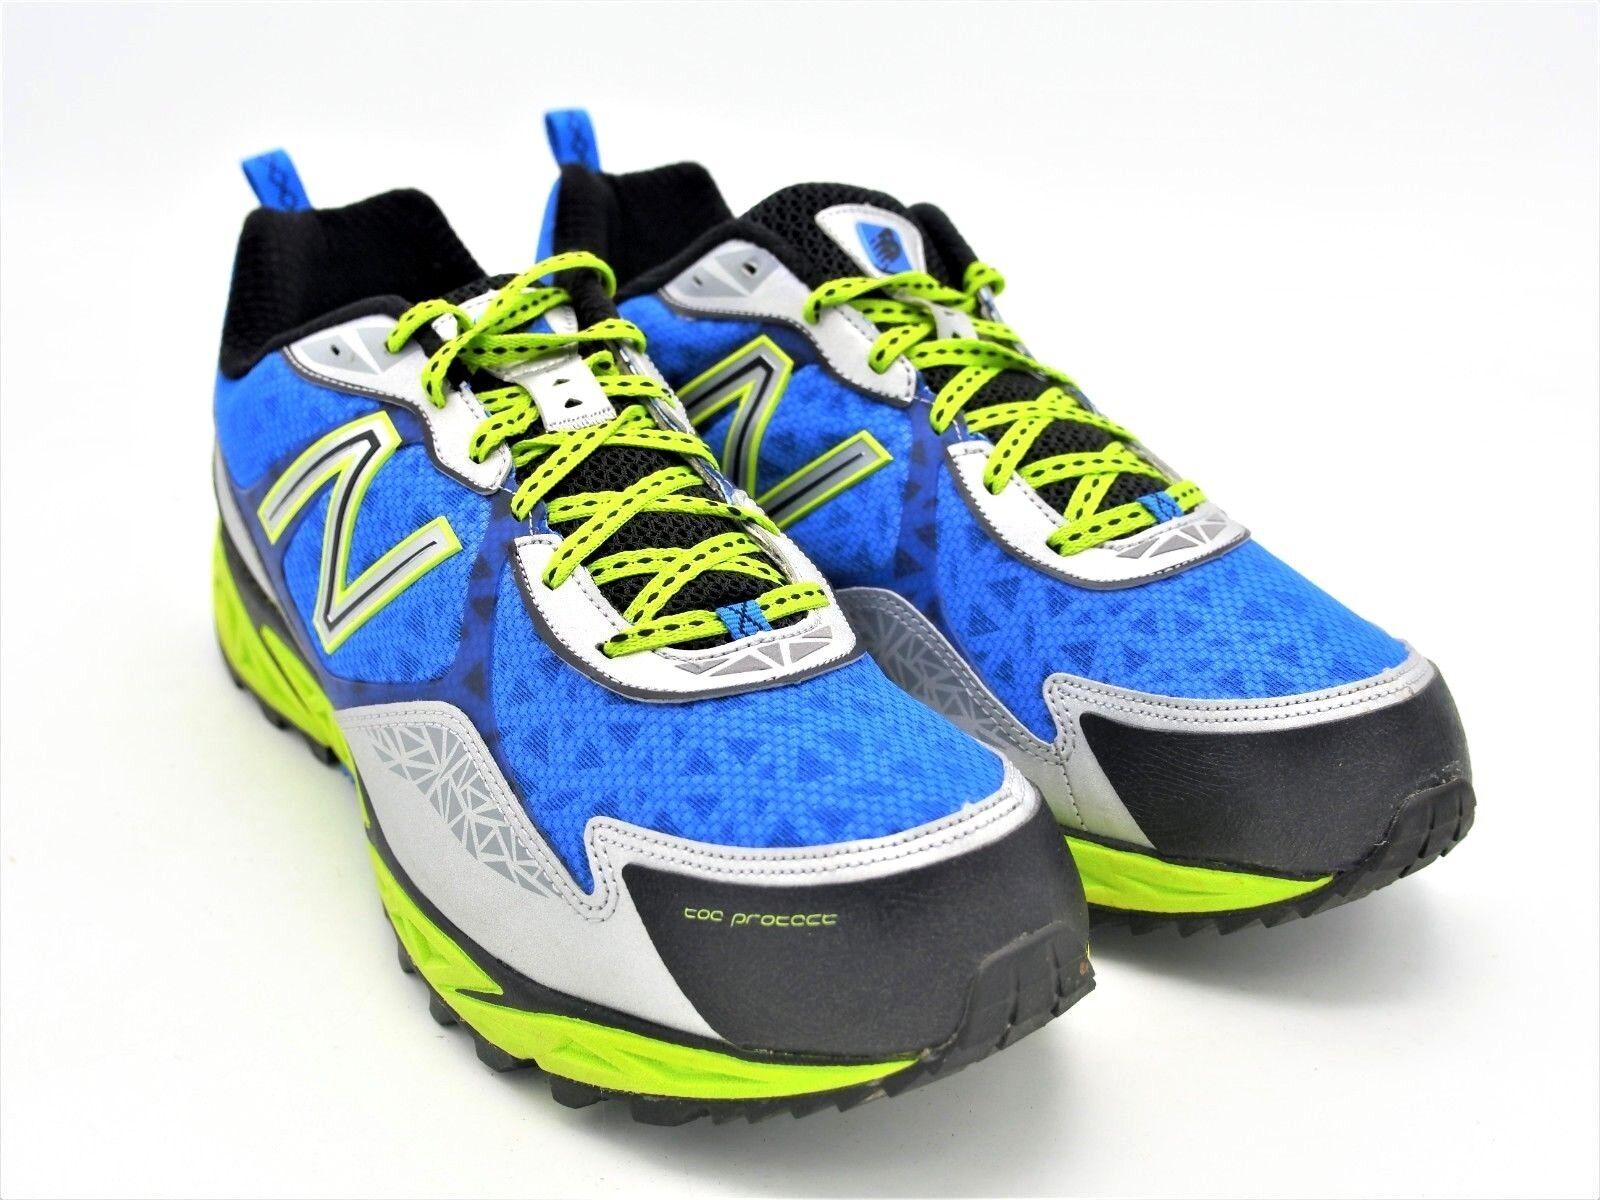 D1814 Pre Owned Men's New Balance 910v1 Running shoes US 12.5 D